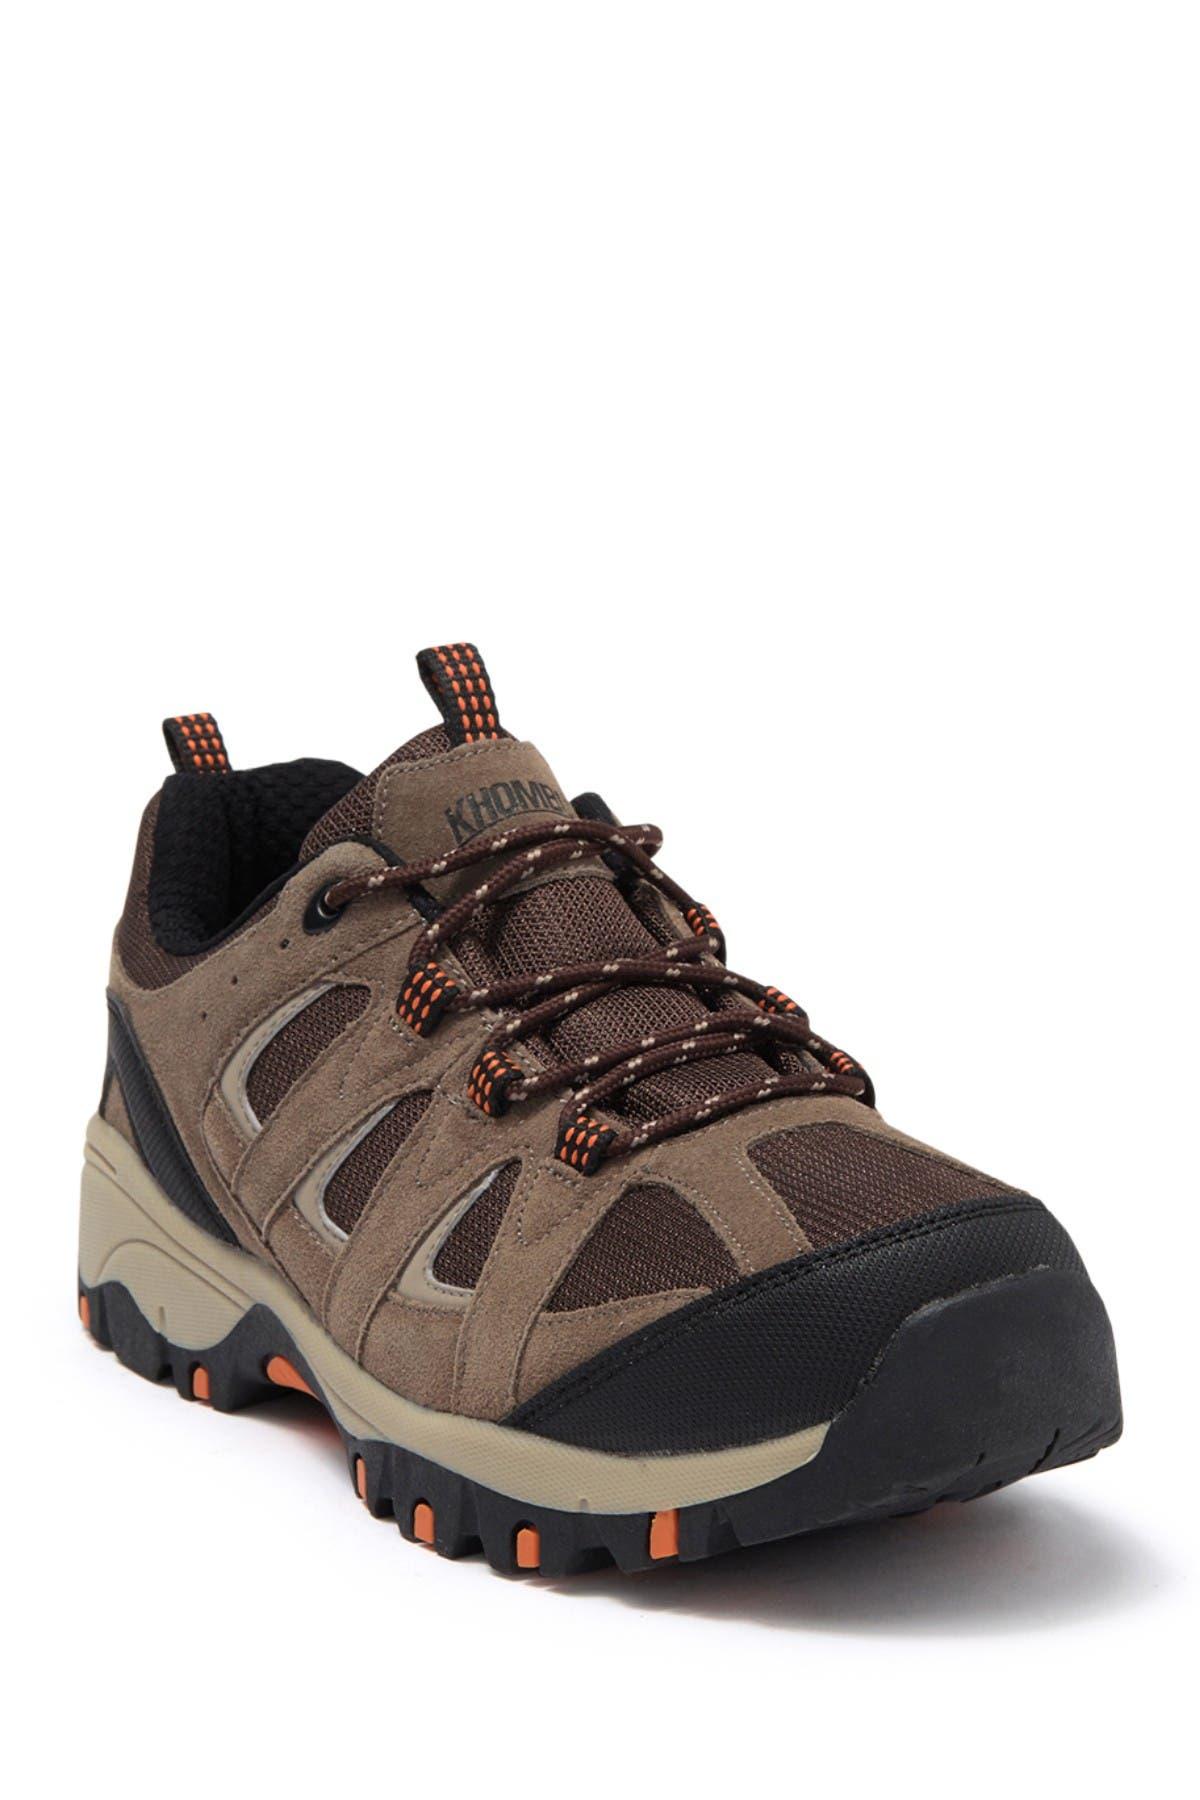 Image of Khombu Provo Training Sneaker